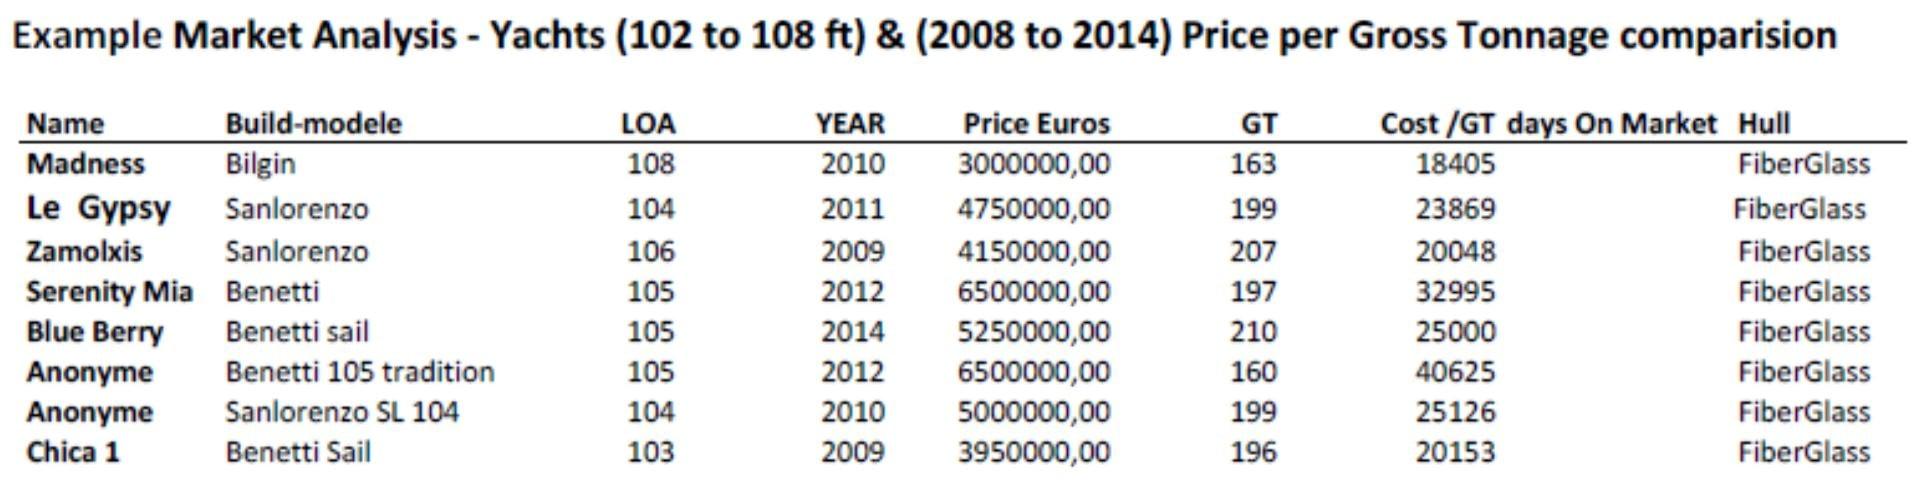 Example Market Analysis